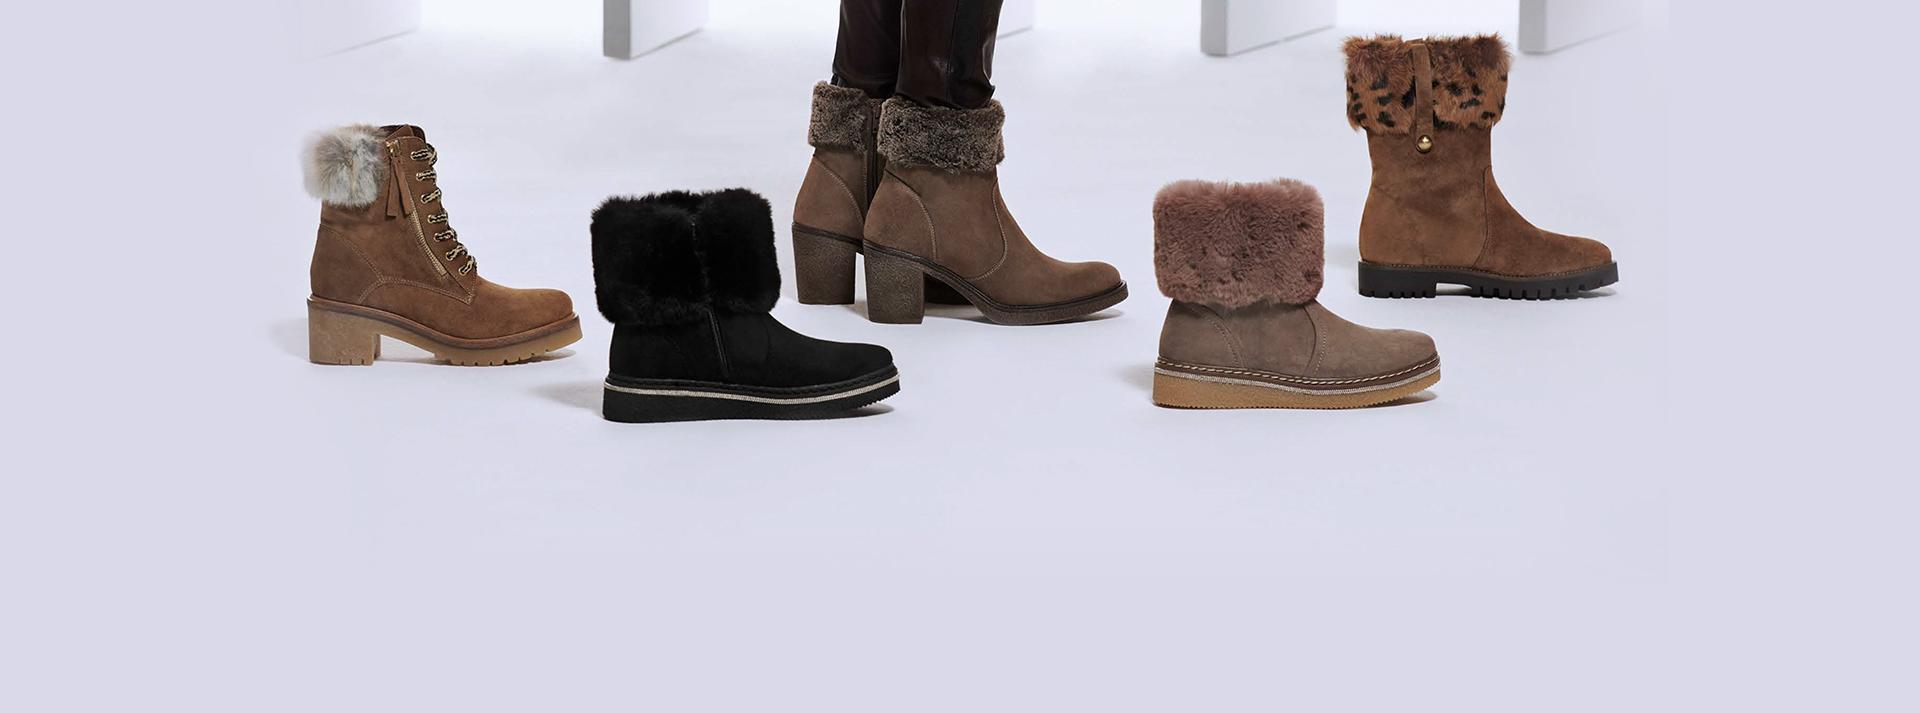 4 tipos de botas para no pasar frío este invierno ideal